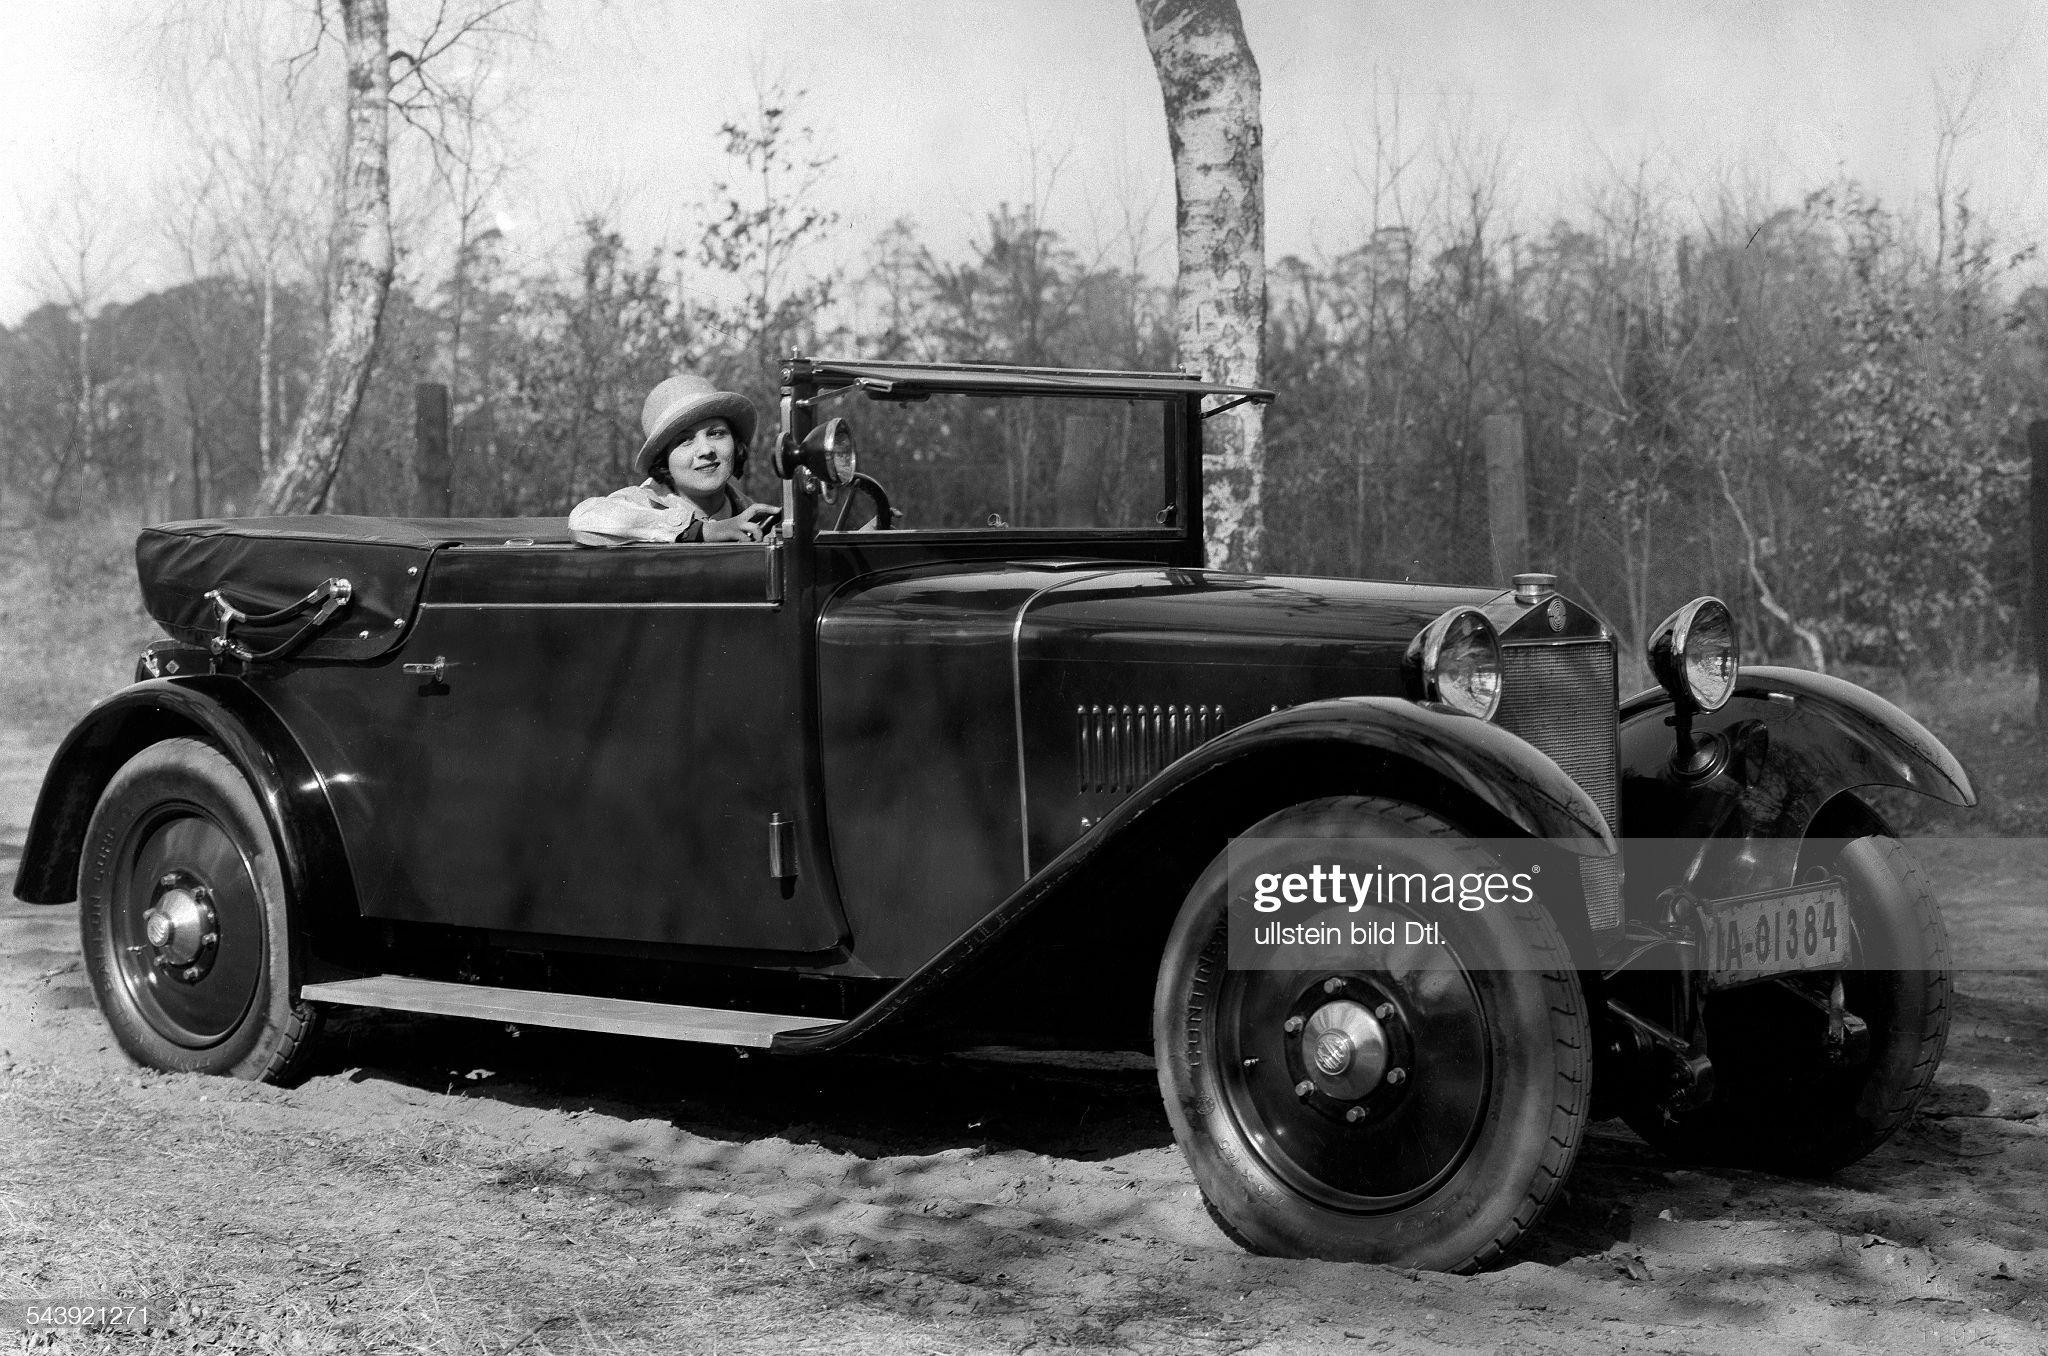 La Porta, Elizza - Actress*01.03.1904-1997+ - in her 6/30 Steyr cabriolet - Photographer: Zander & Labisch- Published by: 'Die Dame' 03/1928/1929Vintage property of ullstein bild : News Photo